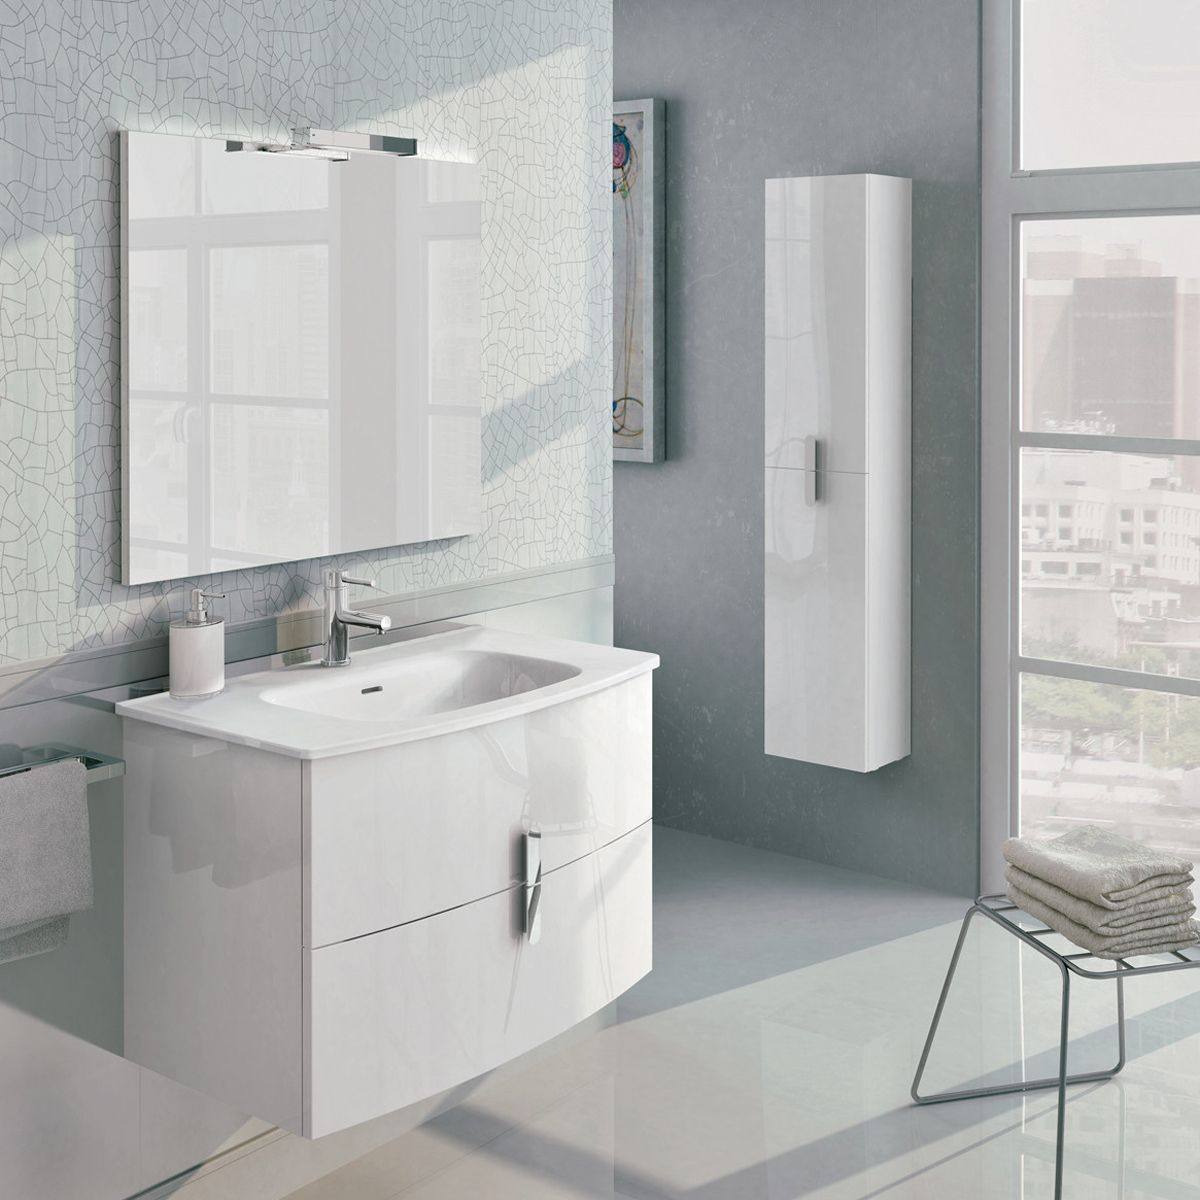 Frontline Emme Gloss White Vanity Unit and Toilet Set